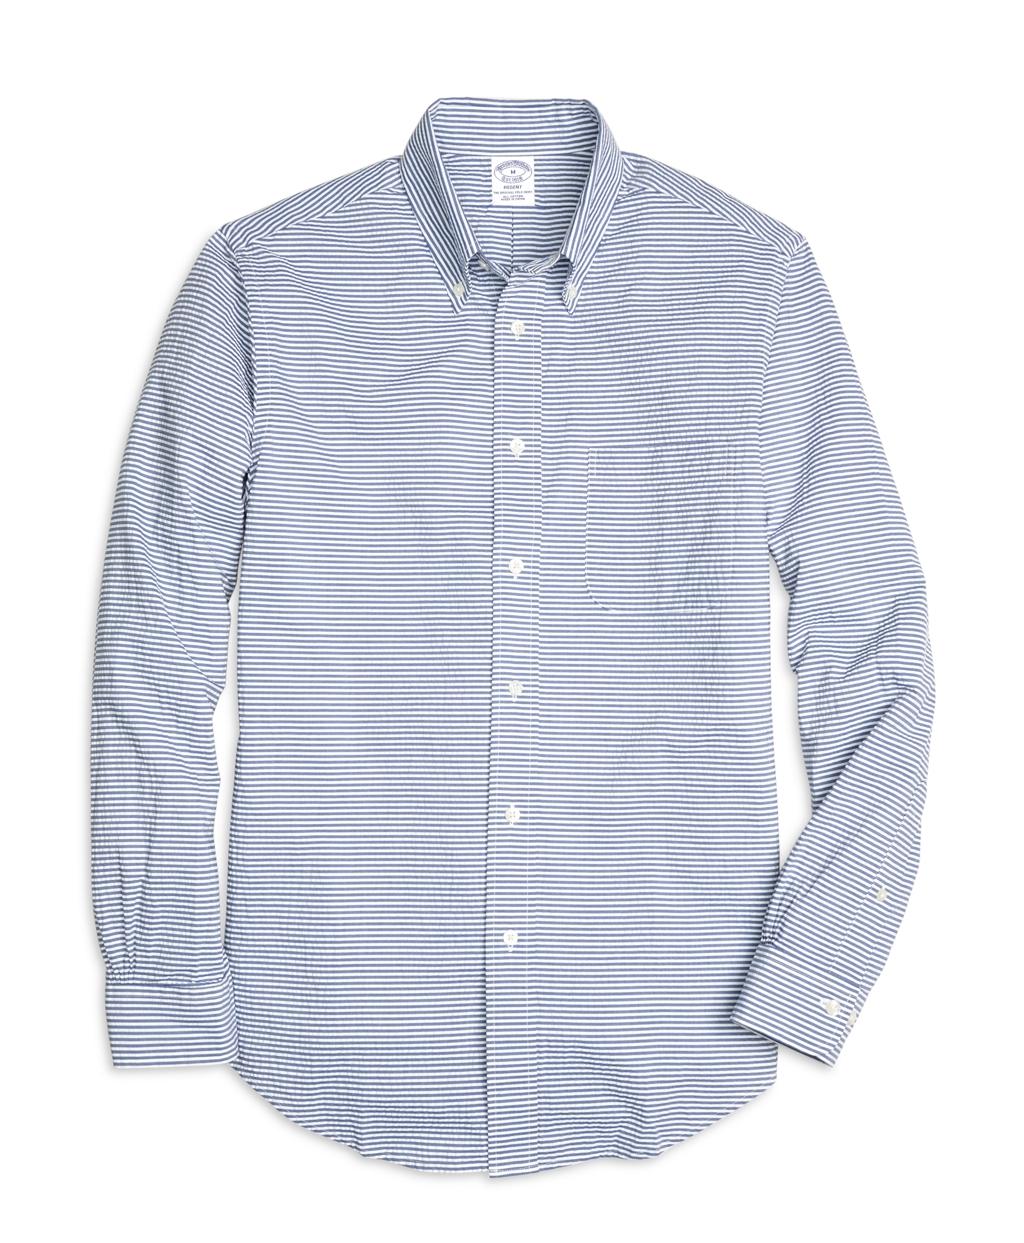 Brooks brothers madison fit horizontal stripe seersucker for Horizontal striped dress shirts men